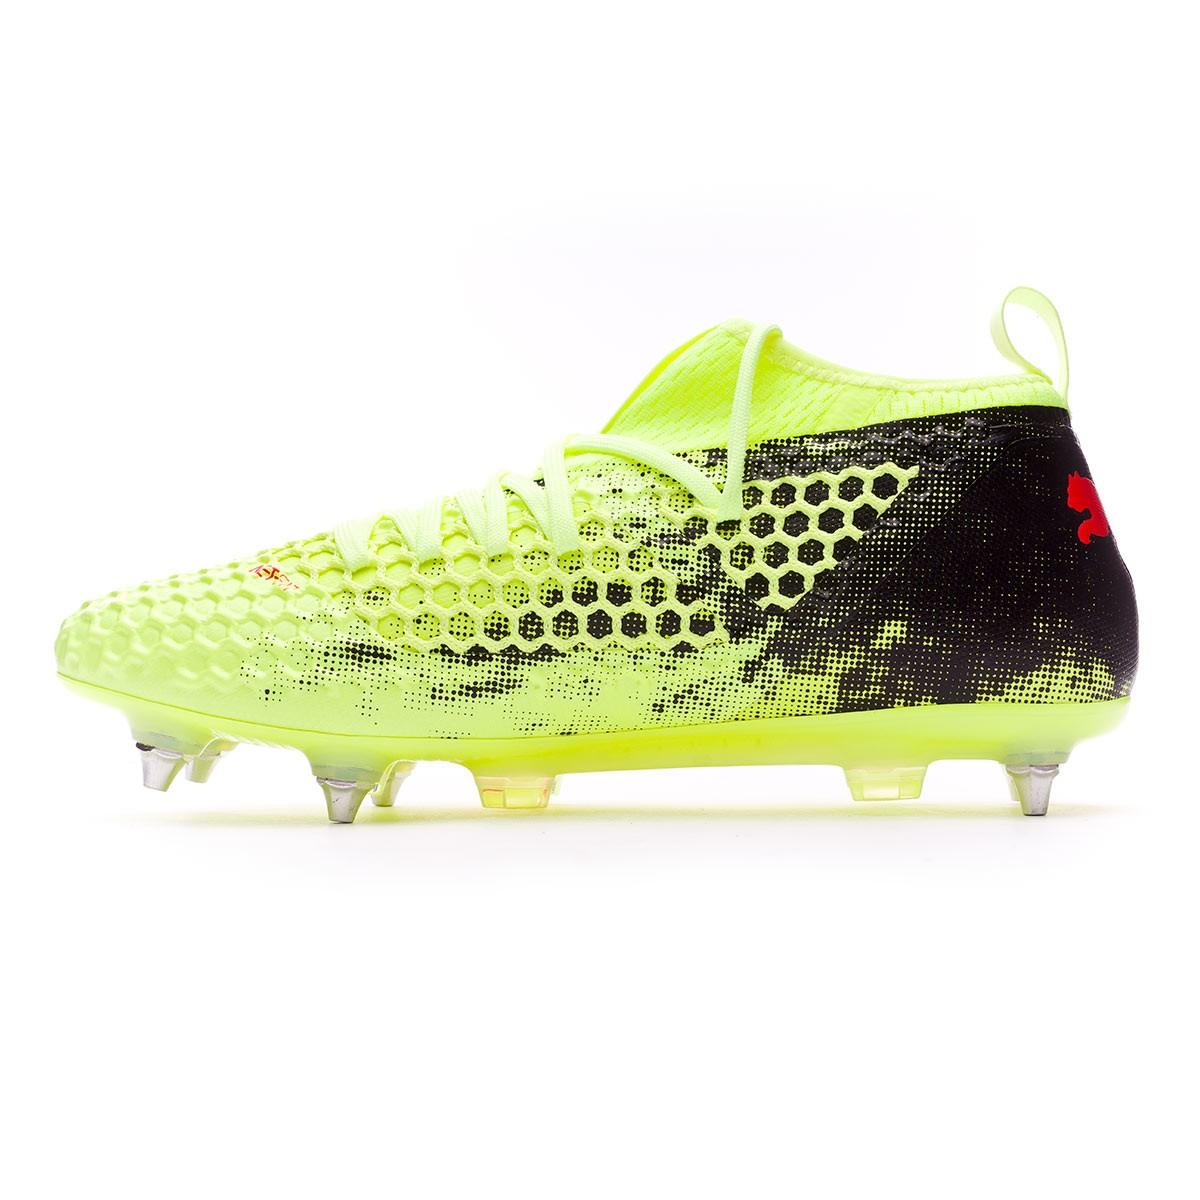 Boot Puma Future 18.2 Netfit SG Fizzy Yellow-Red Blast-Puma Black -  Football store Fútbol Emotion 140d7c64b